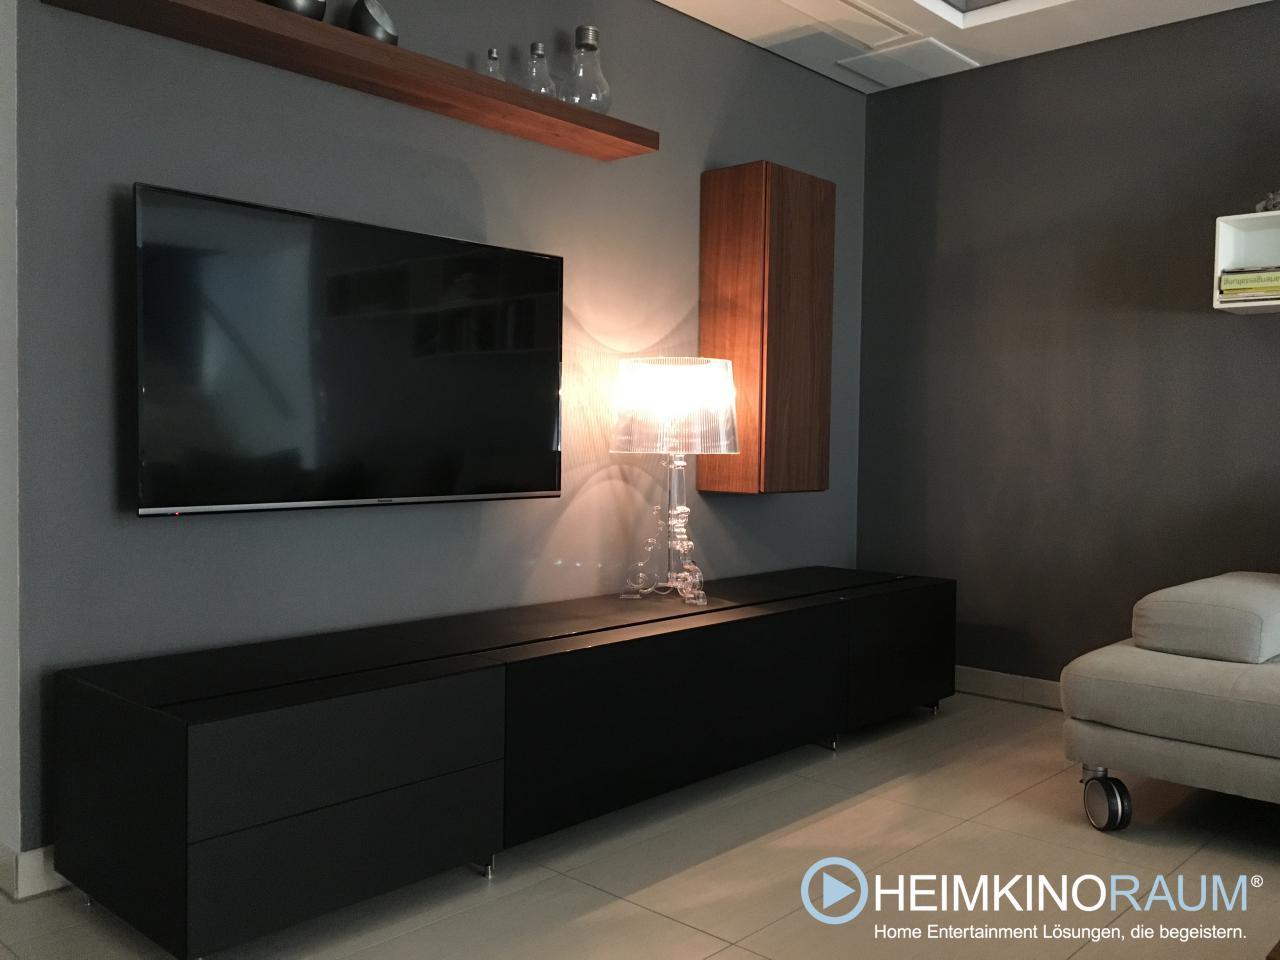 heimkinoraum the art of flight heimkino in regensburg. Black Bedroom Furniture Sets. Home Design Ideas